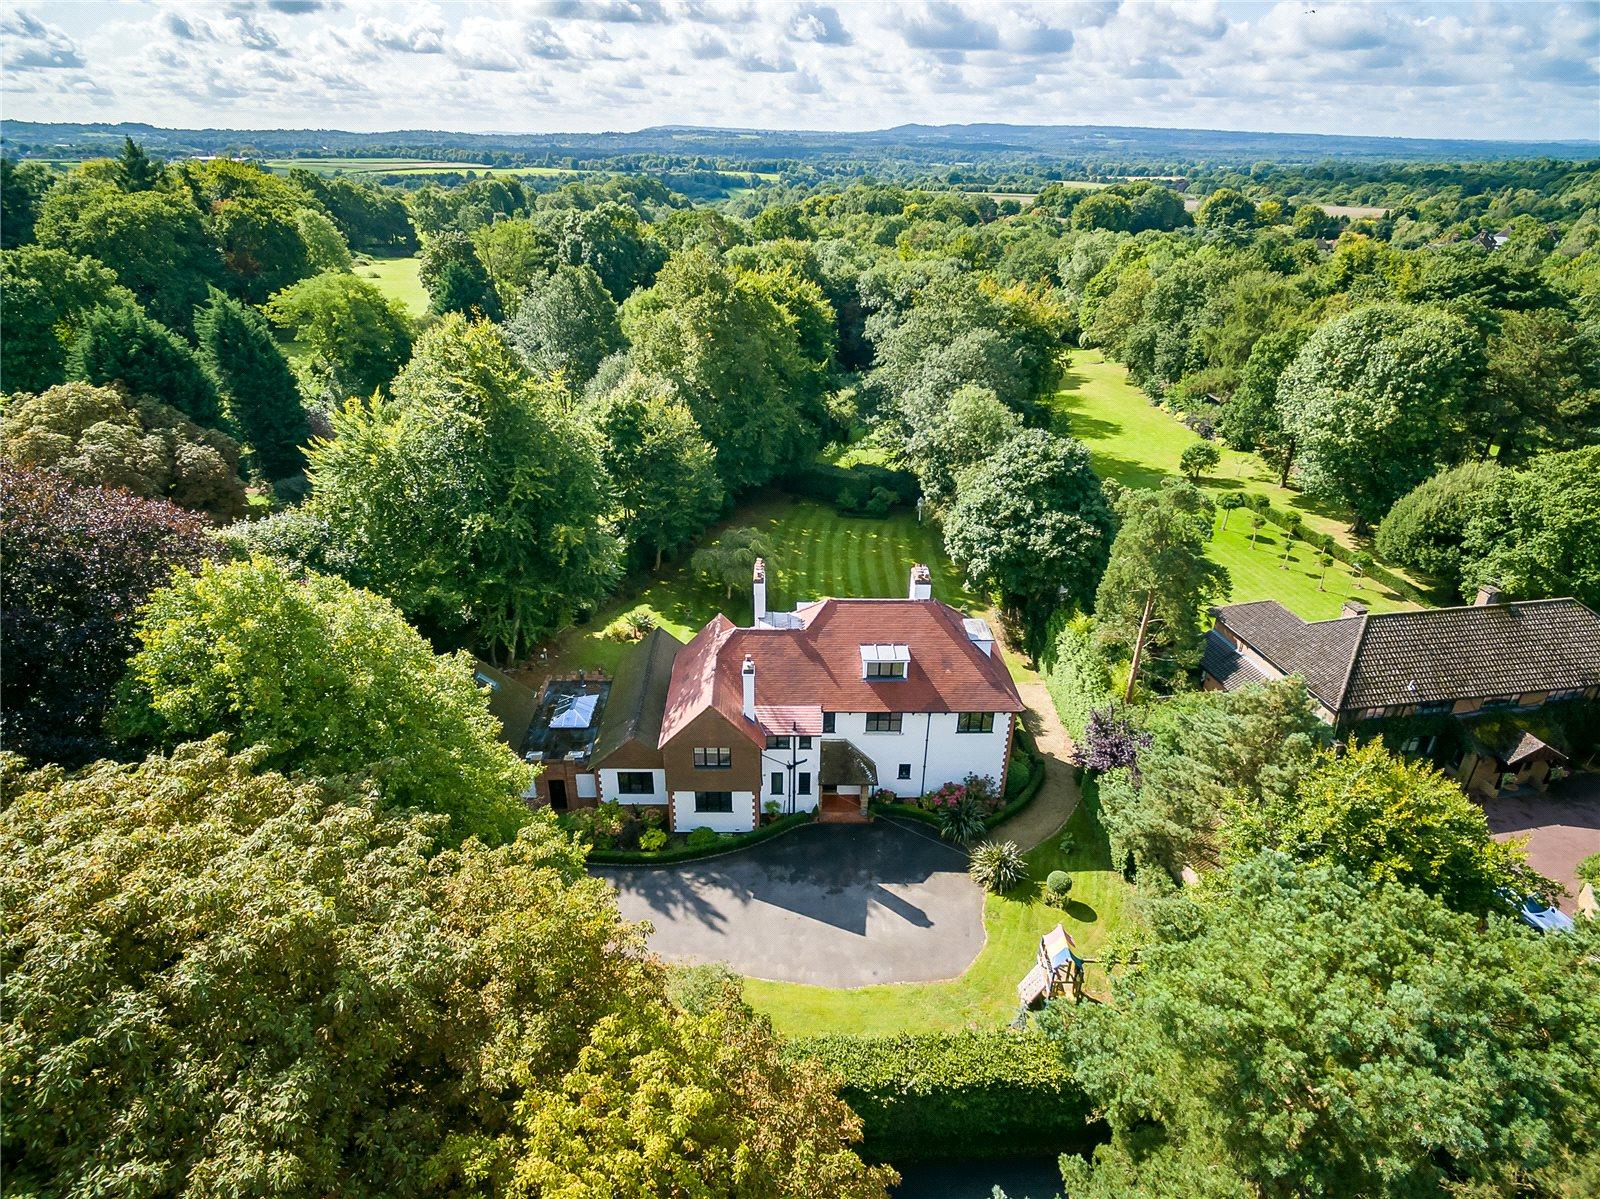 Villa per Vendita alle ore Hurtmore Road, Hurtmore, Godalming, Surrey, GU7 Godalming, Inghilterra